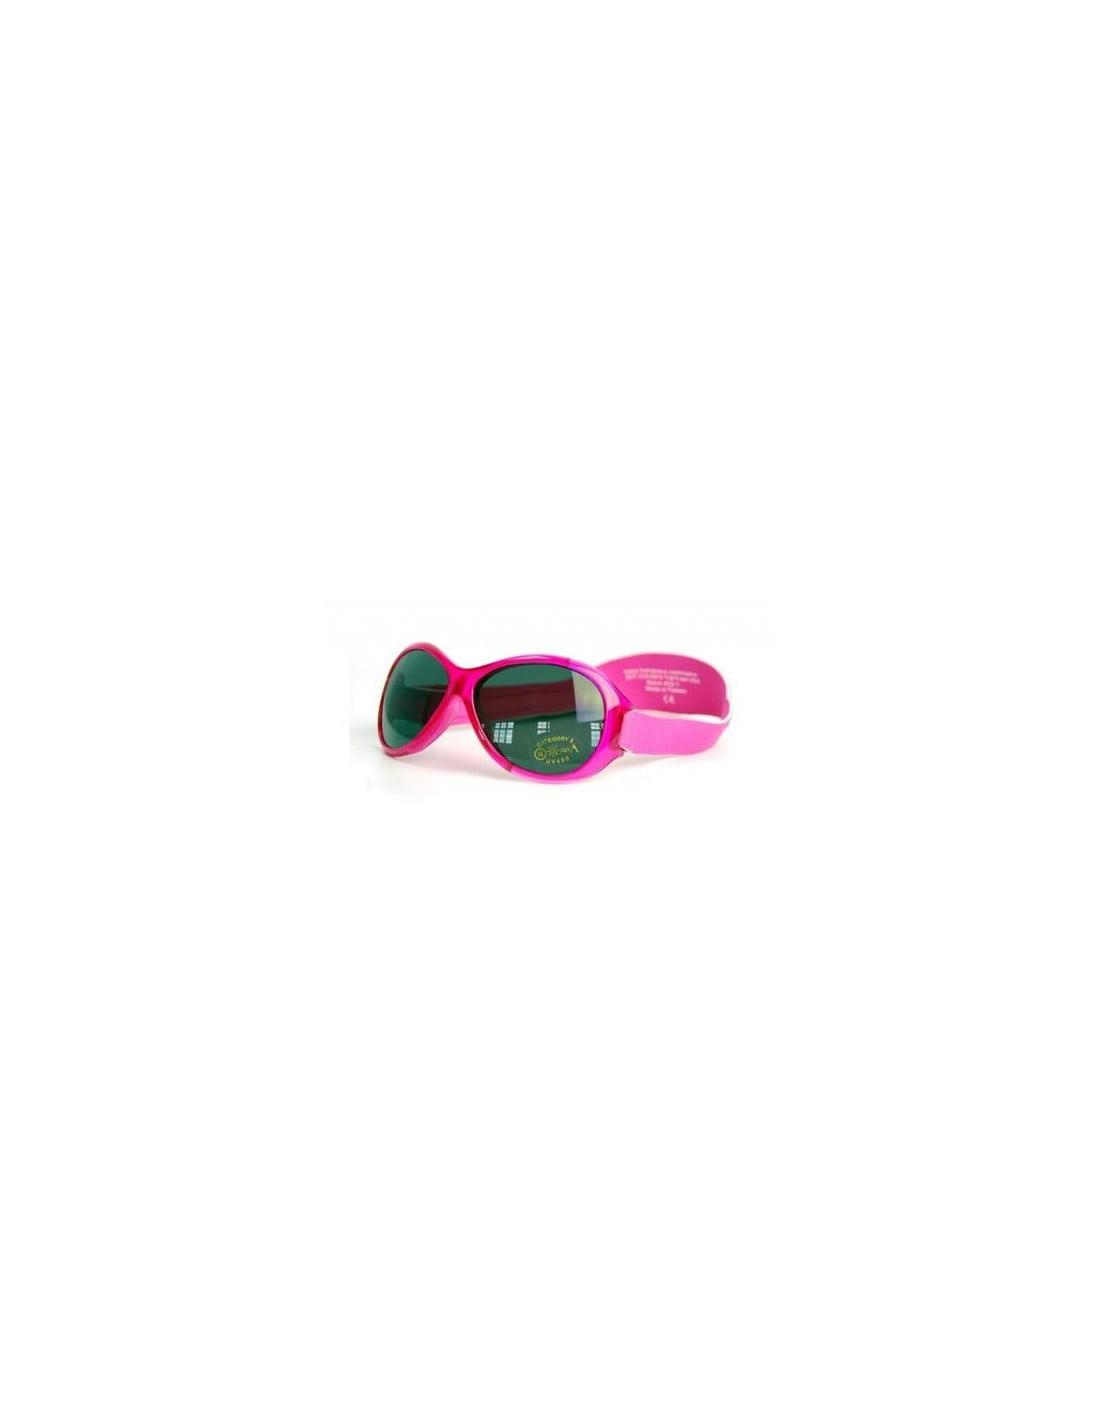 Ochelari de soare Bebe 0-2 ani Retro Oval Pink Banz 2